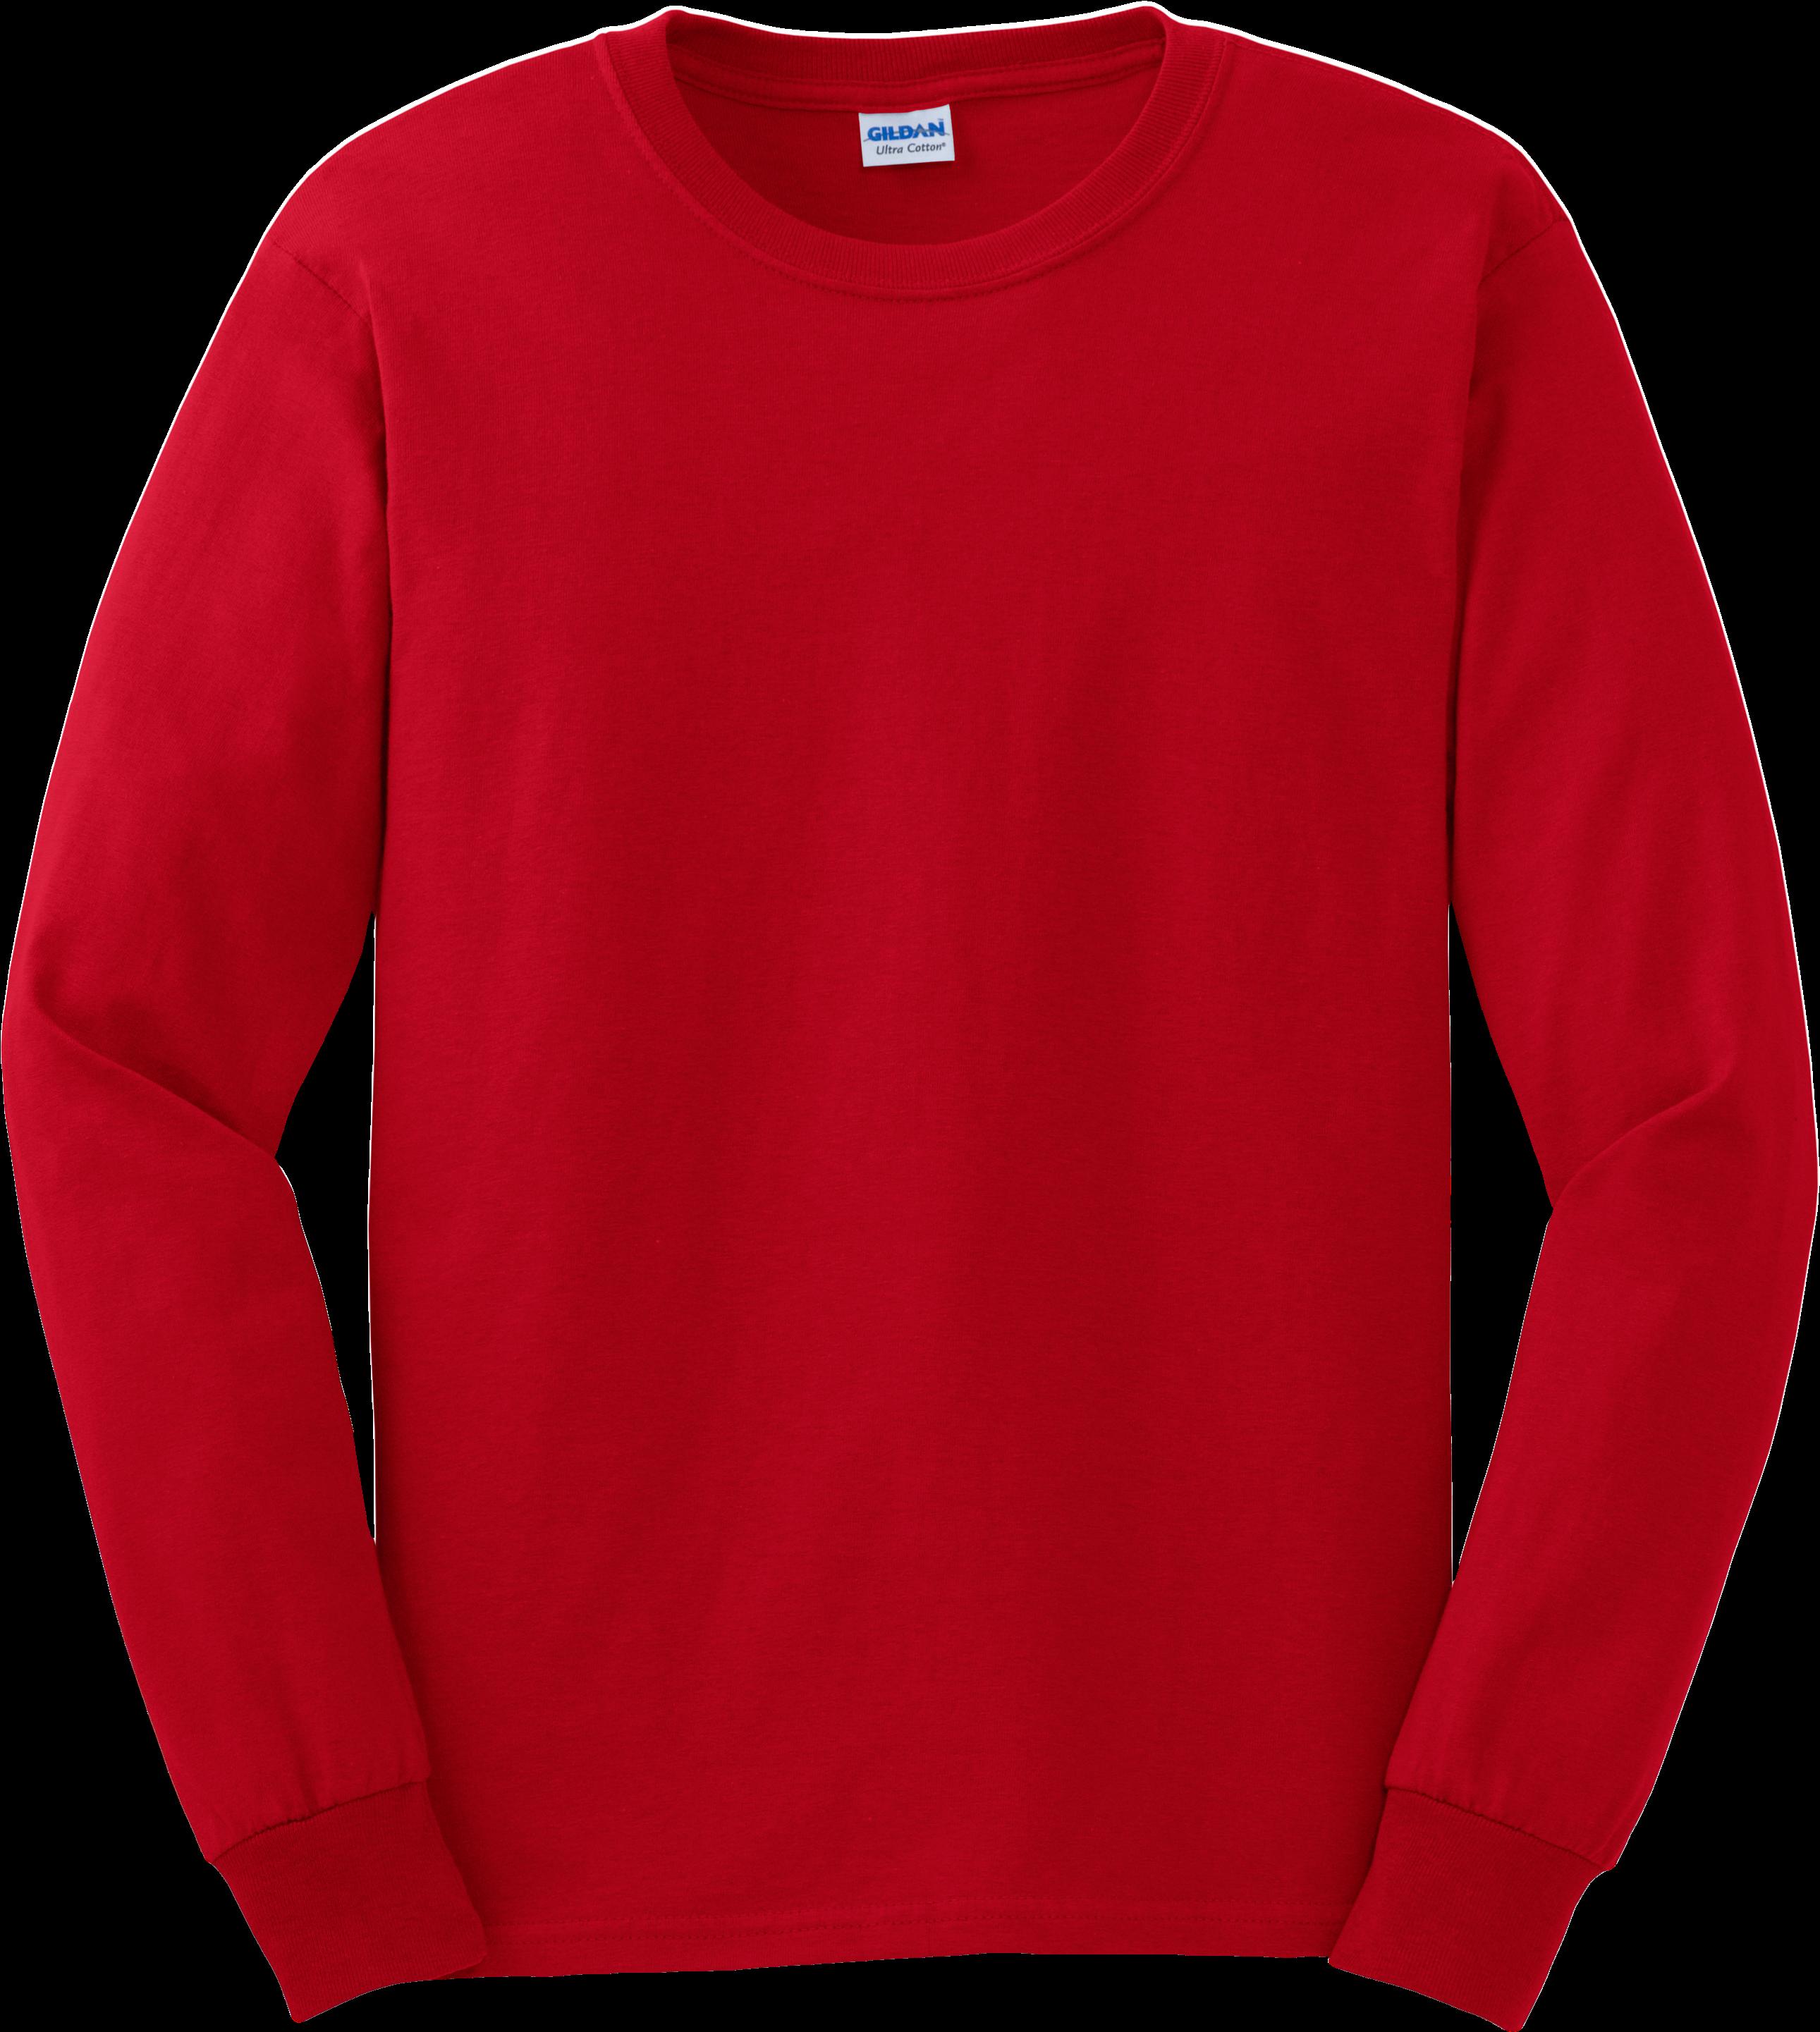 25+ Konsep Desain Kaos Lengan Panjang Warna Putih, Warna Kaos